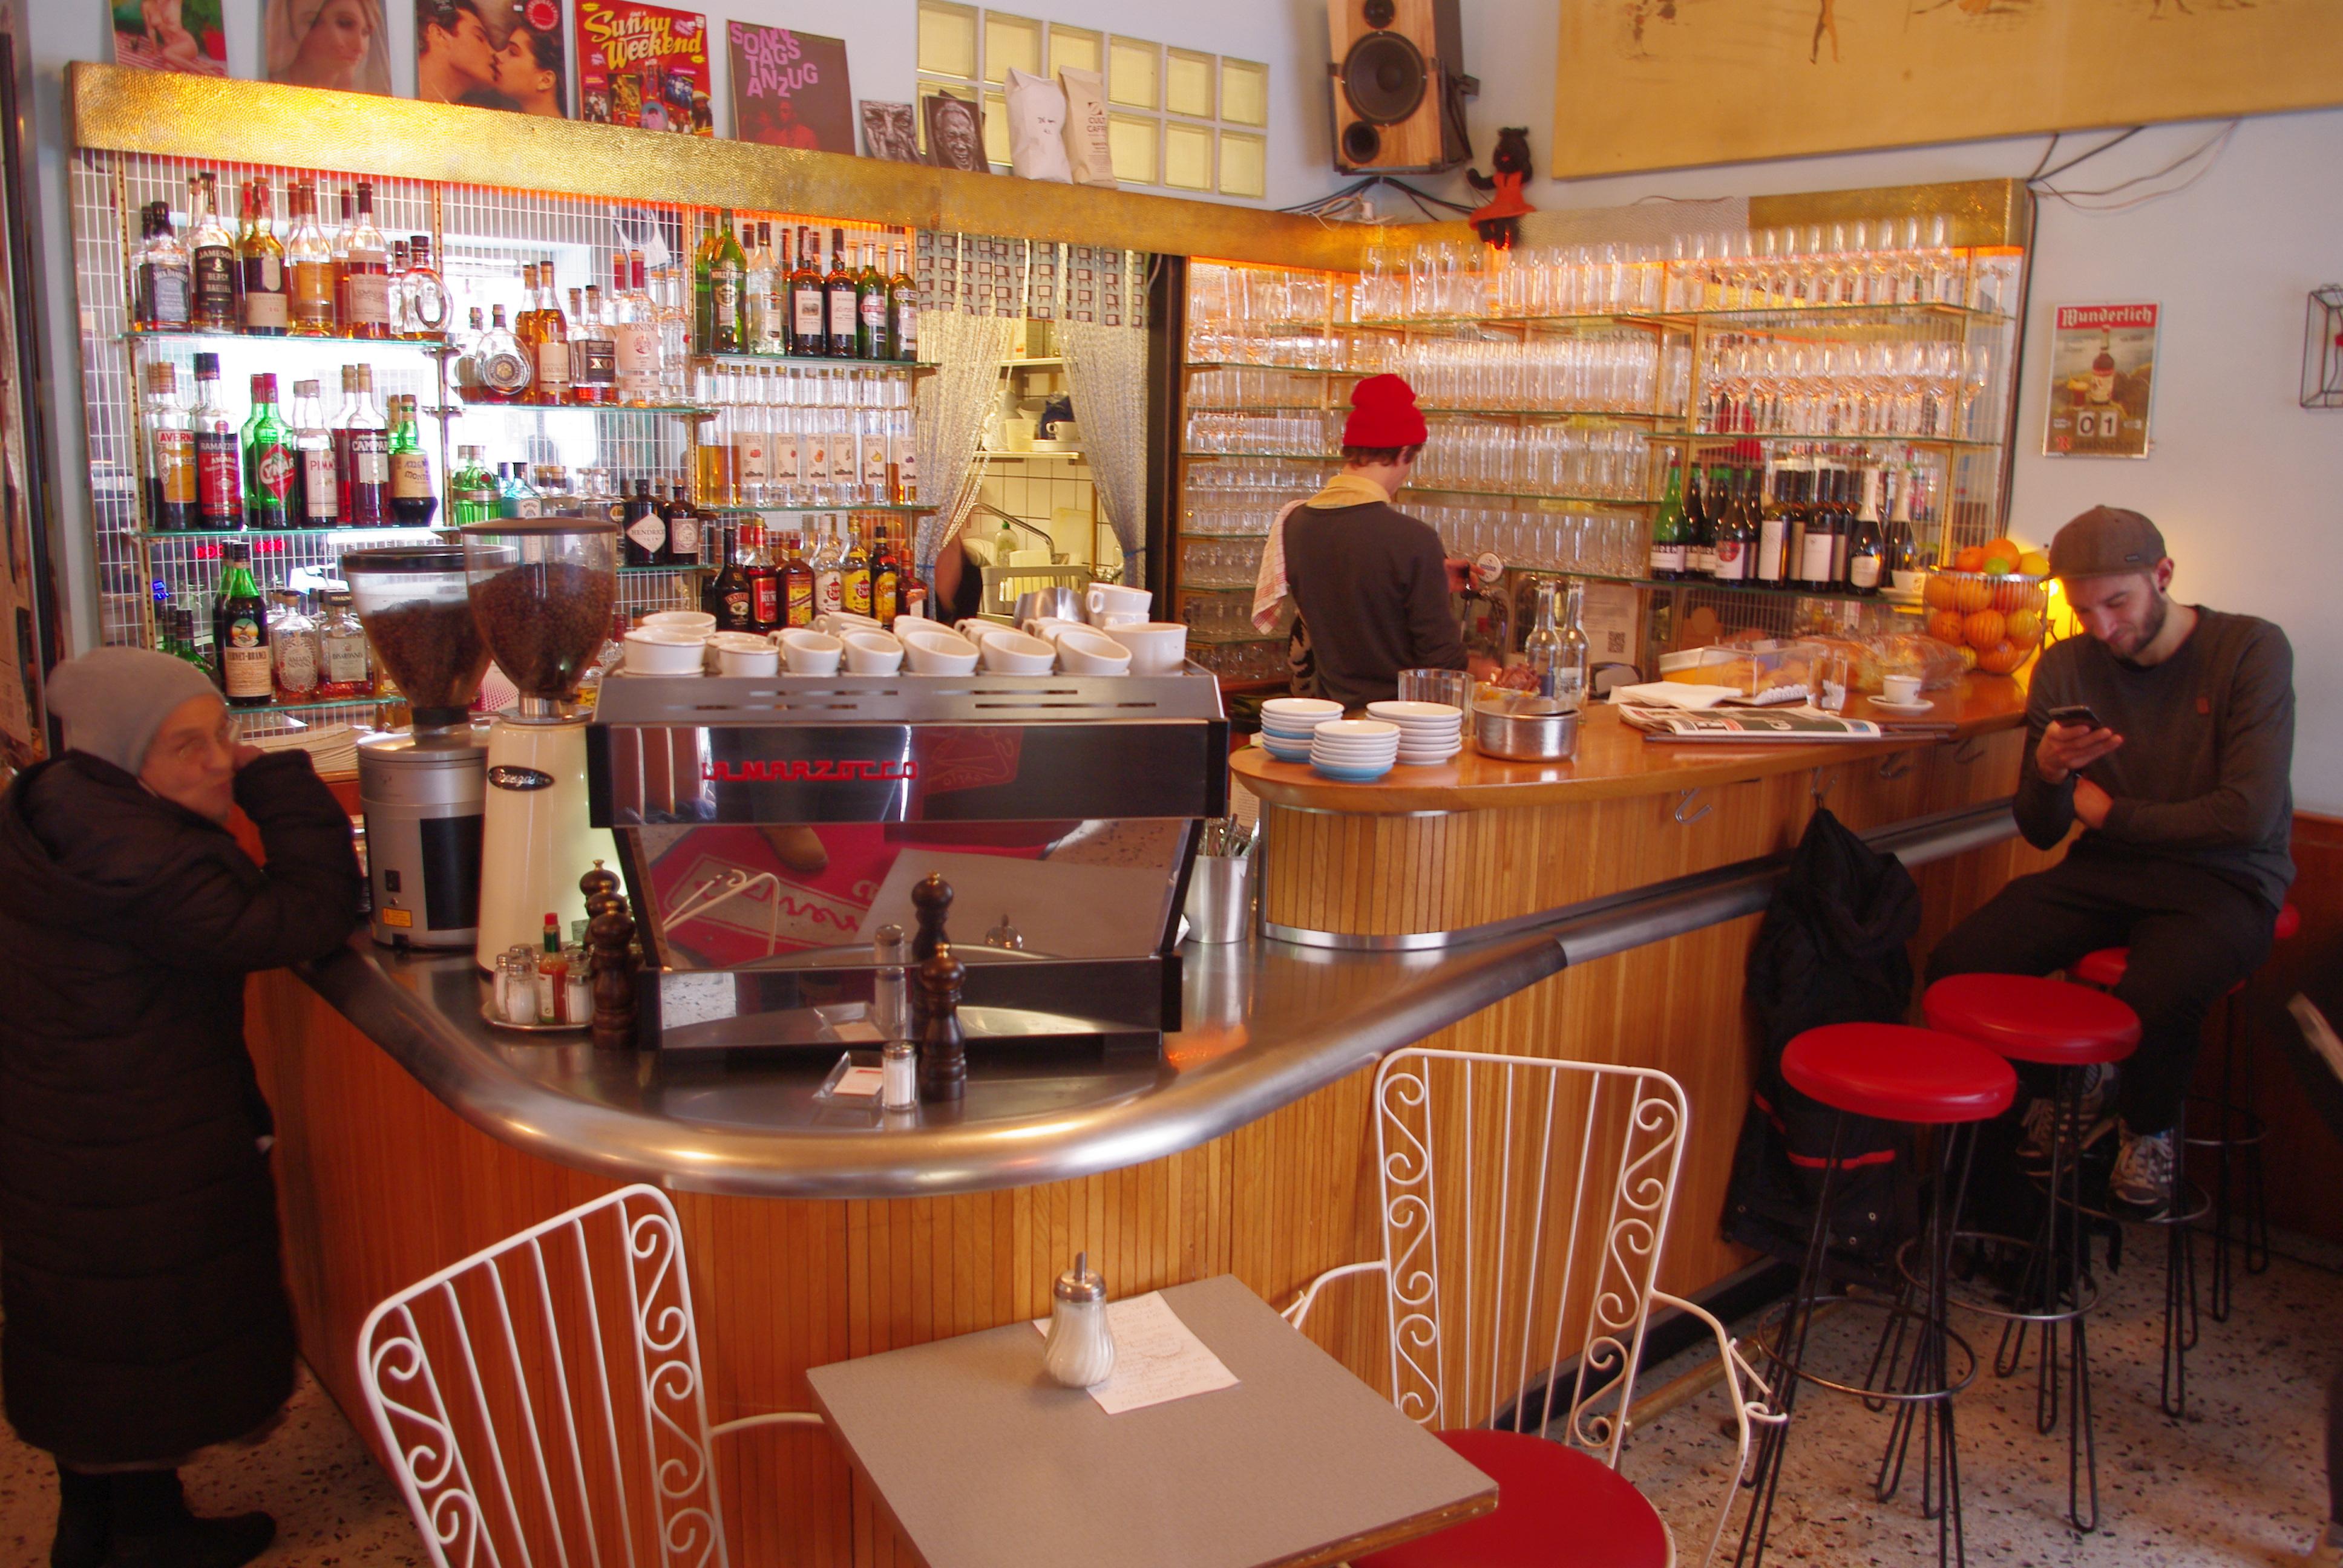 espresso caf bar vienna mycityhighlight. Black Bedroom Furniture Sets. Home Design Ideas